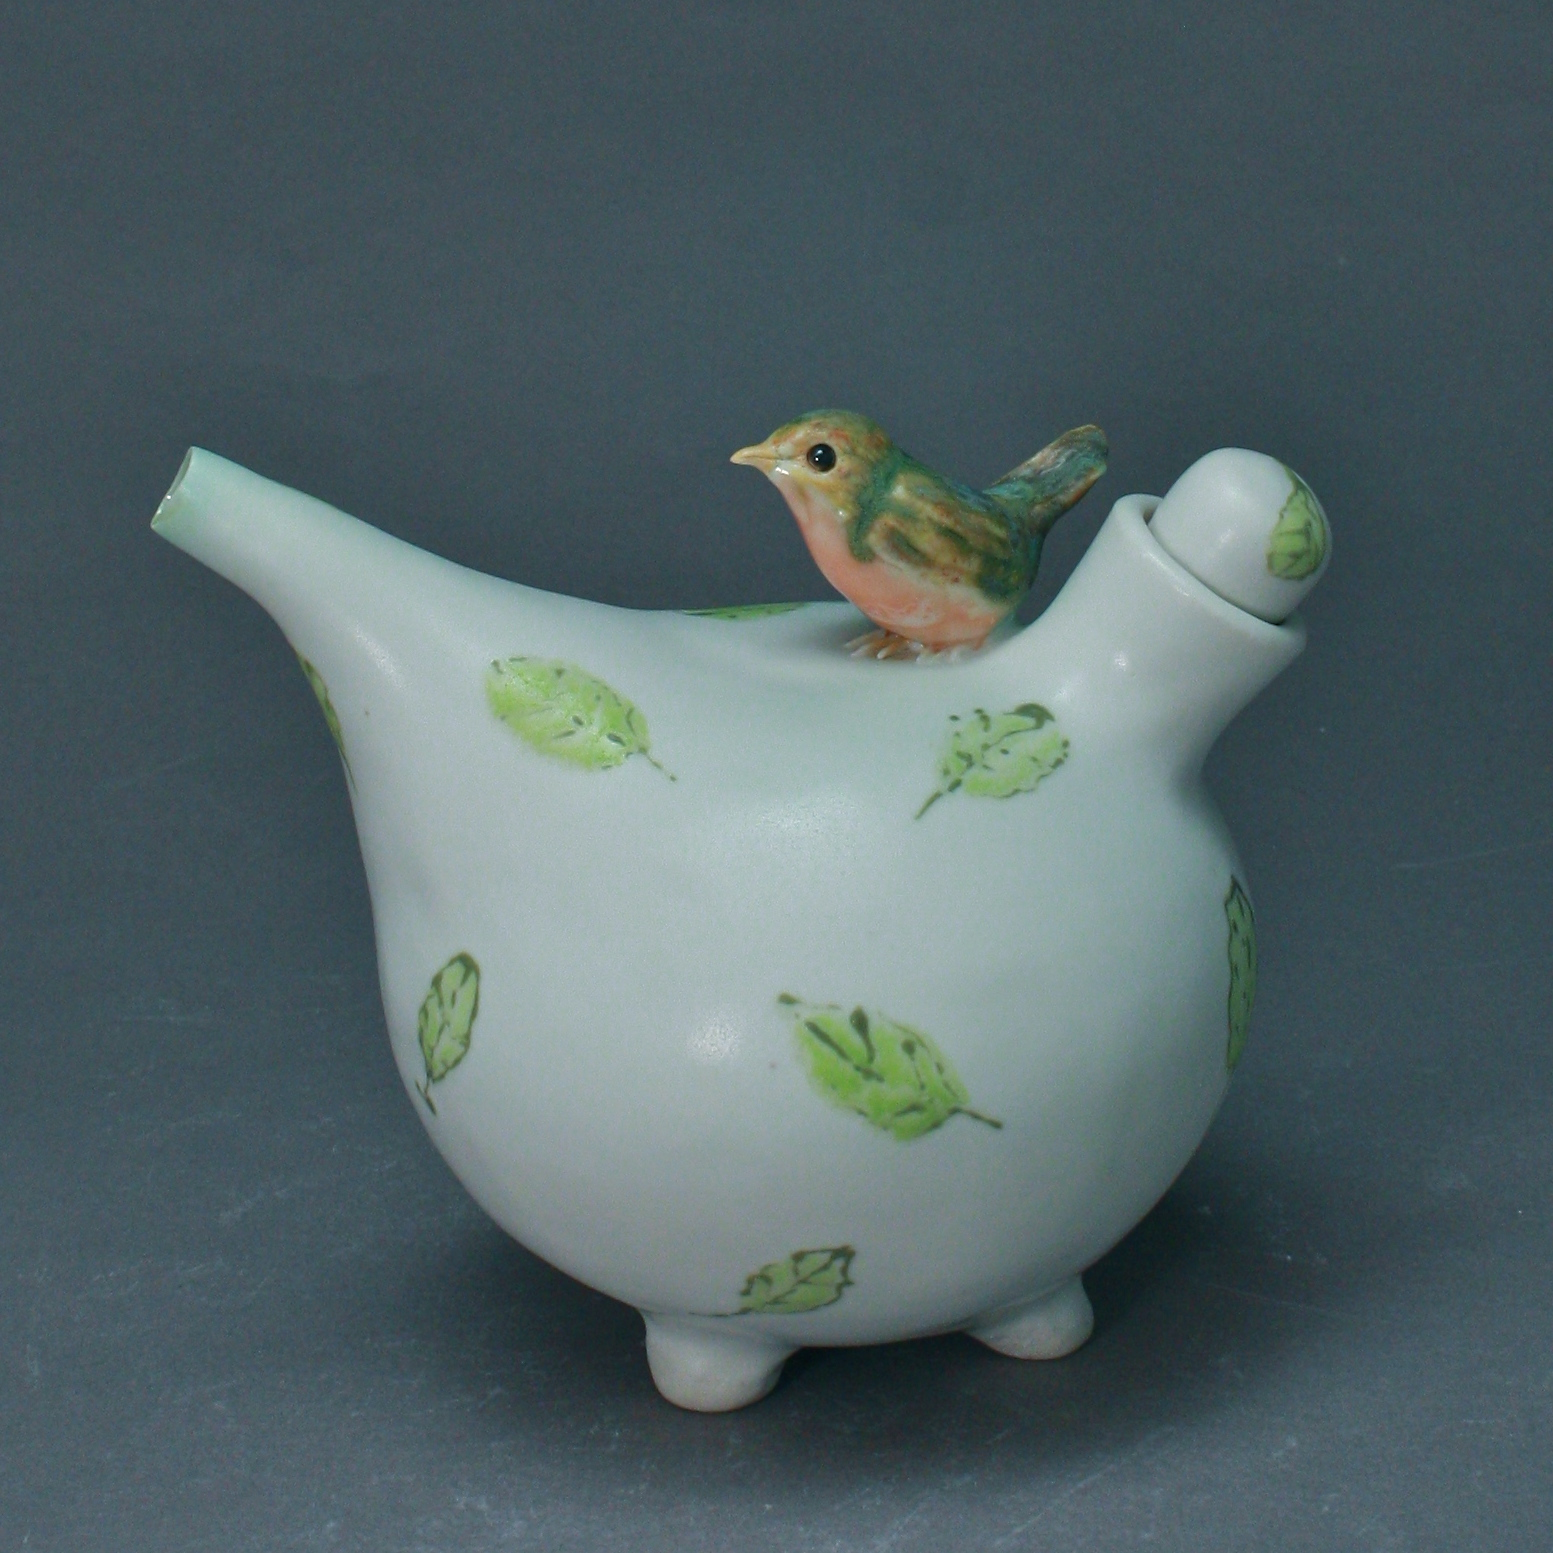 OC-03 | Green Leaves White Oil Cruet with Robin ($160)